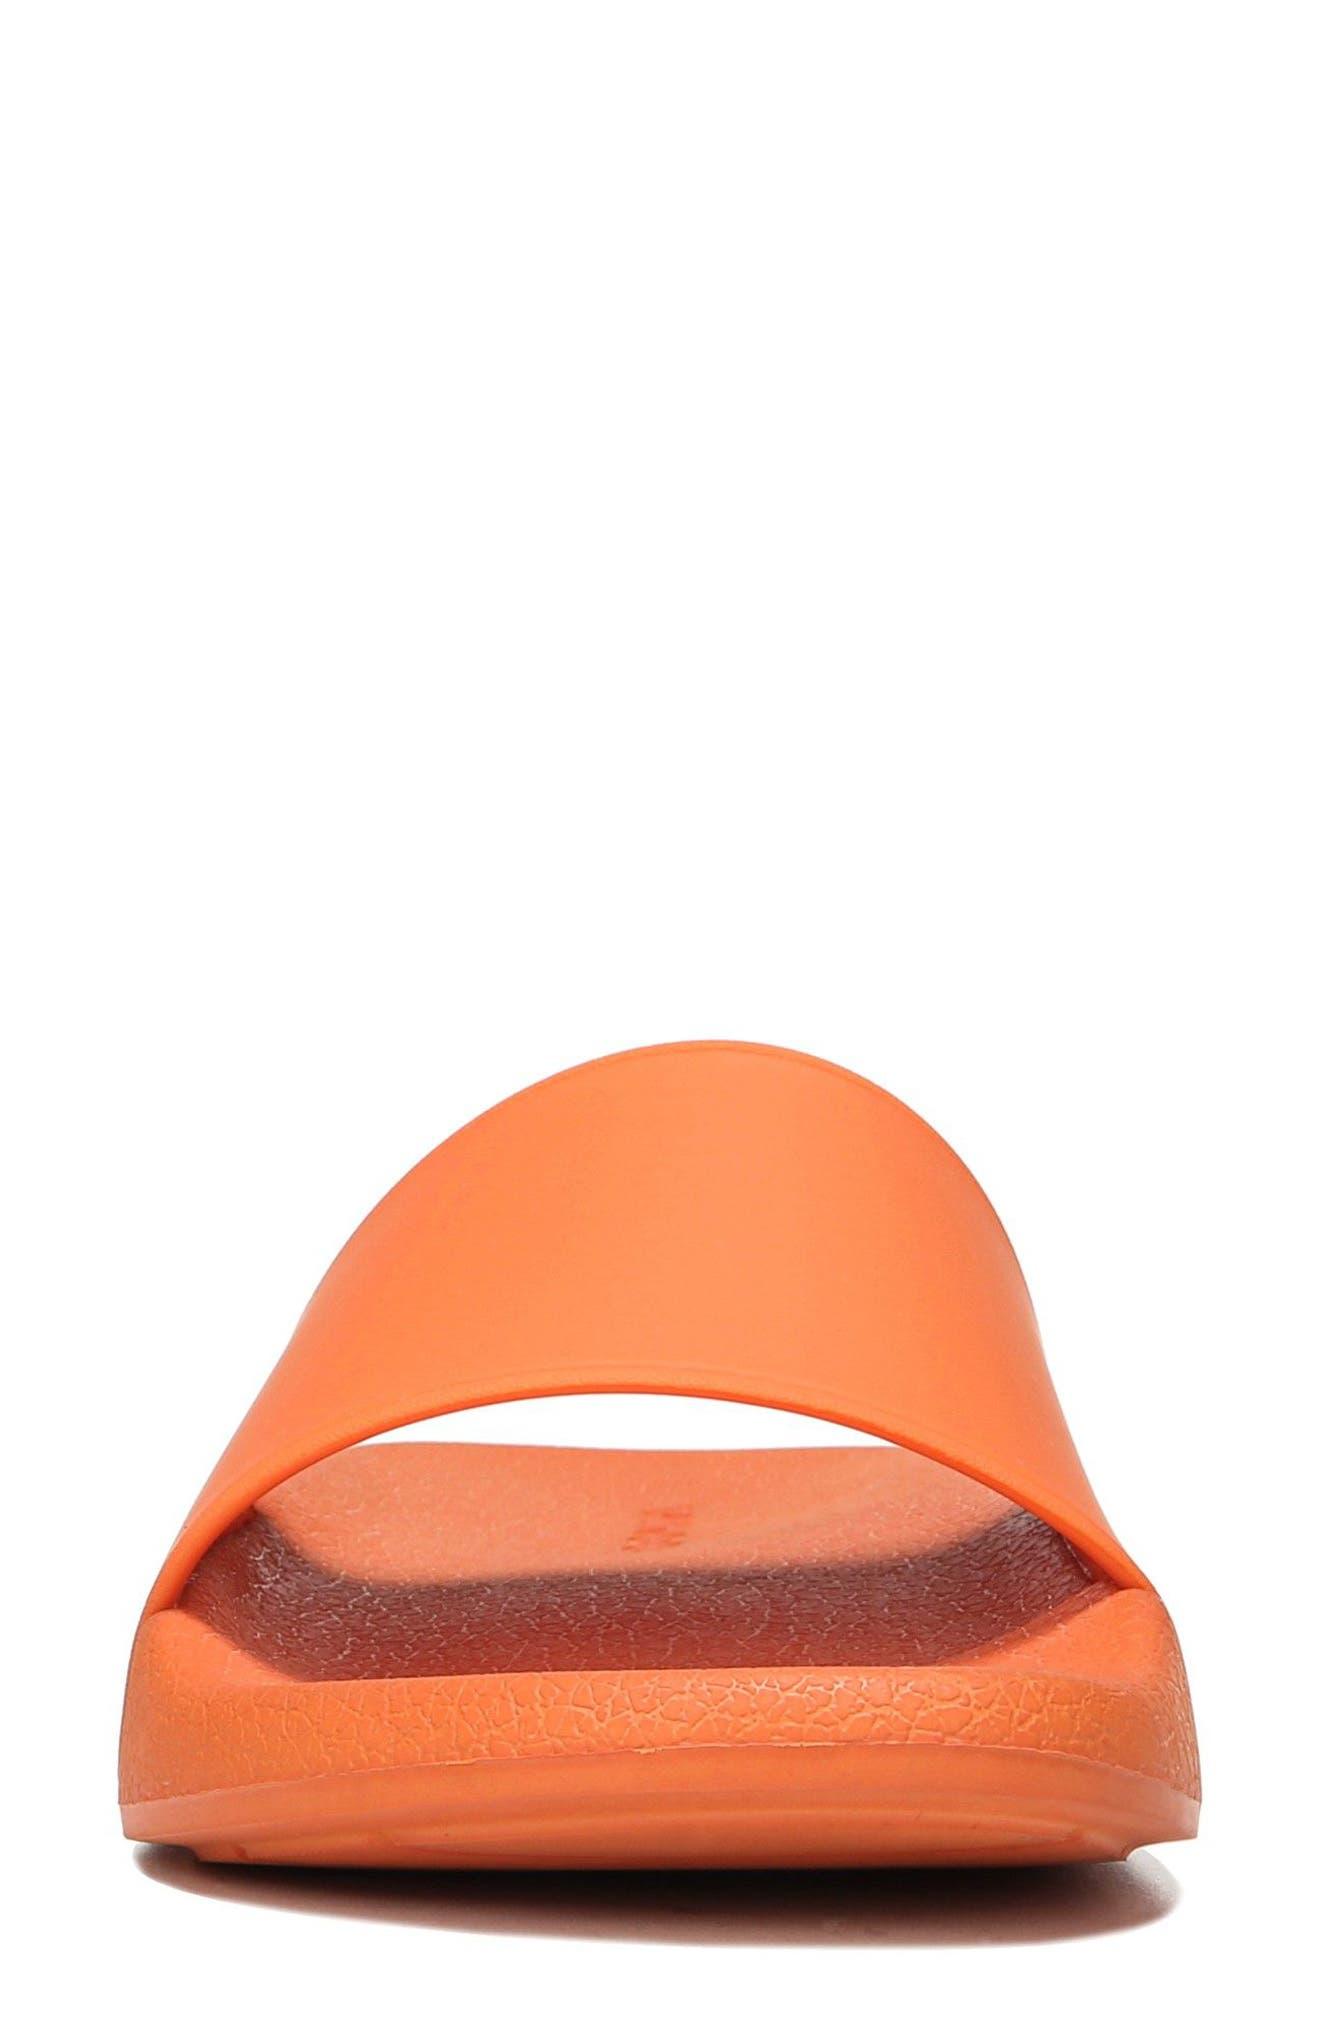 Westcoast Slide Sandal,                             Alternate thumbnail 27, color,